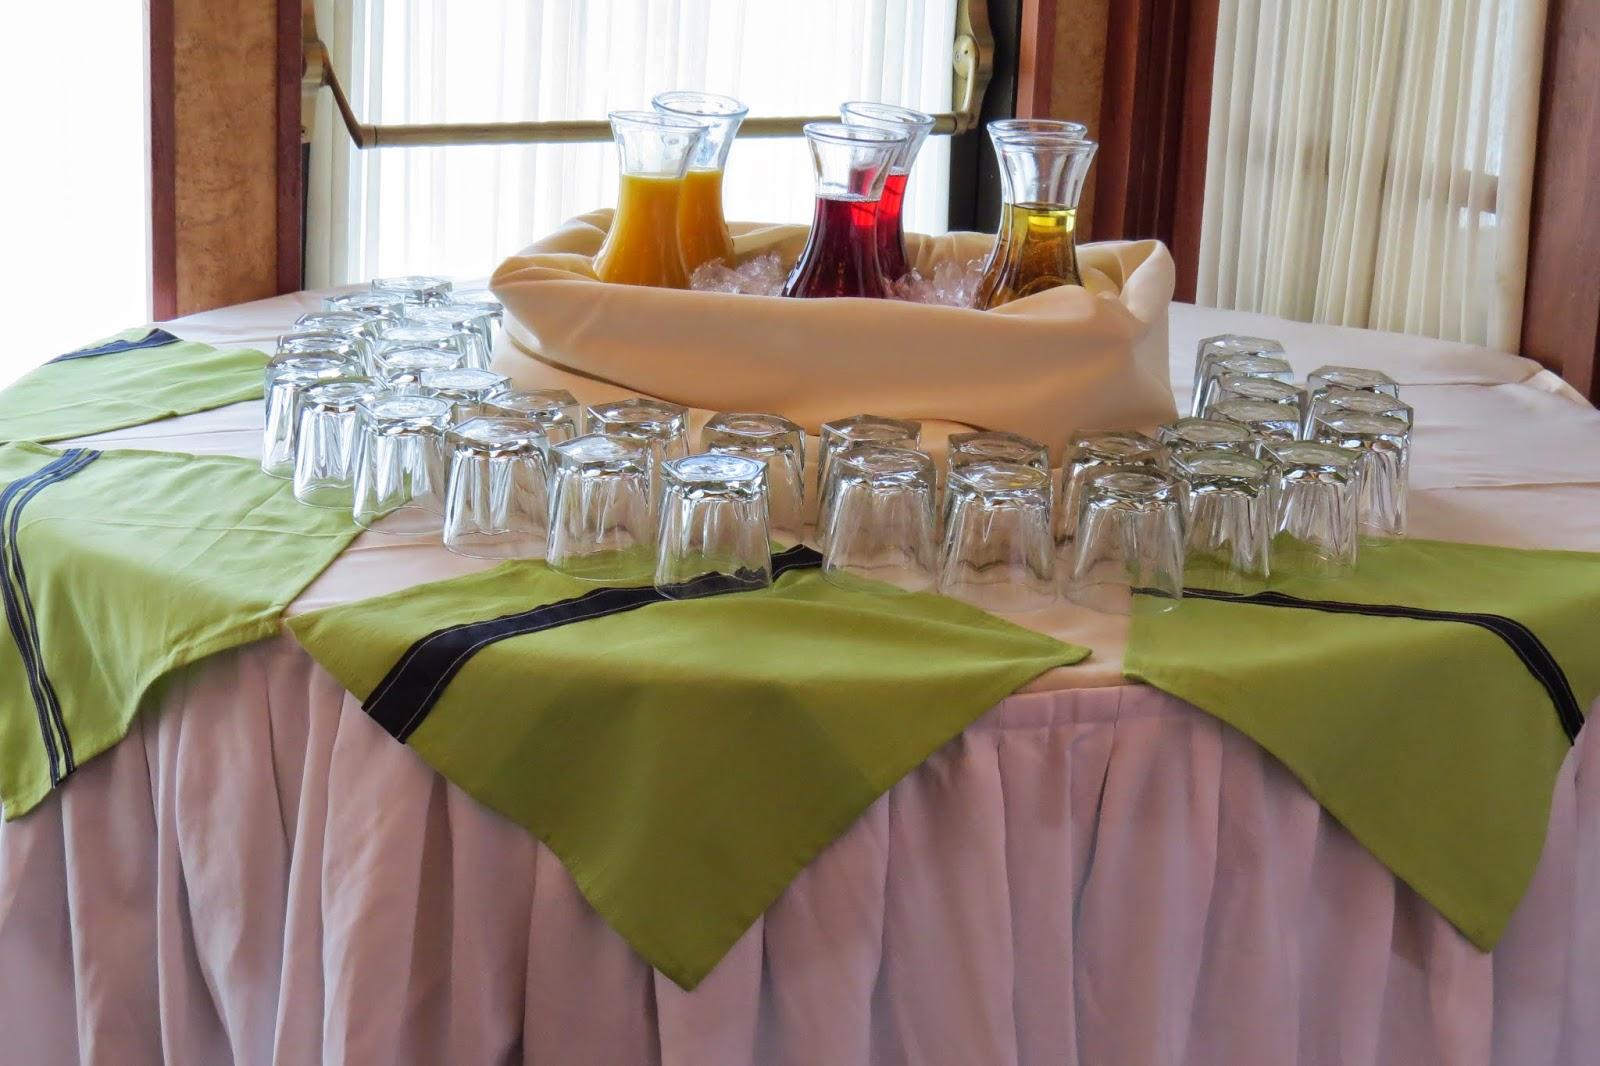 Table Decor, Napkins, Navy grosgrain ribbon, sew, white stitching